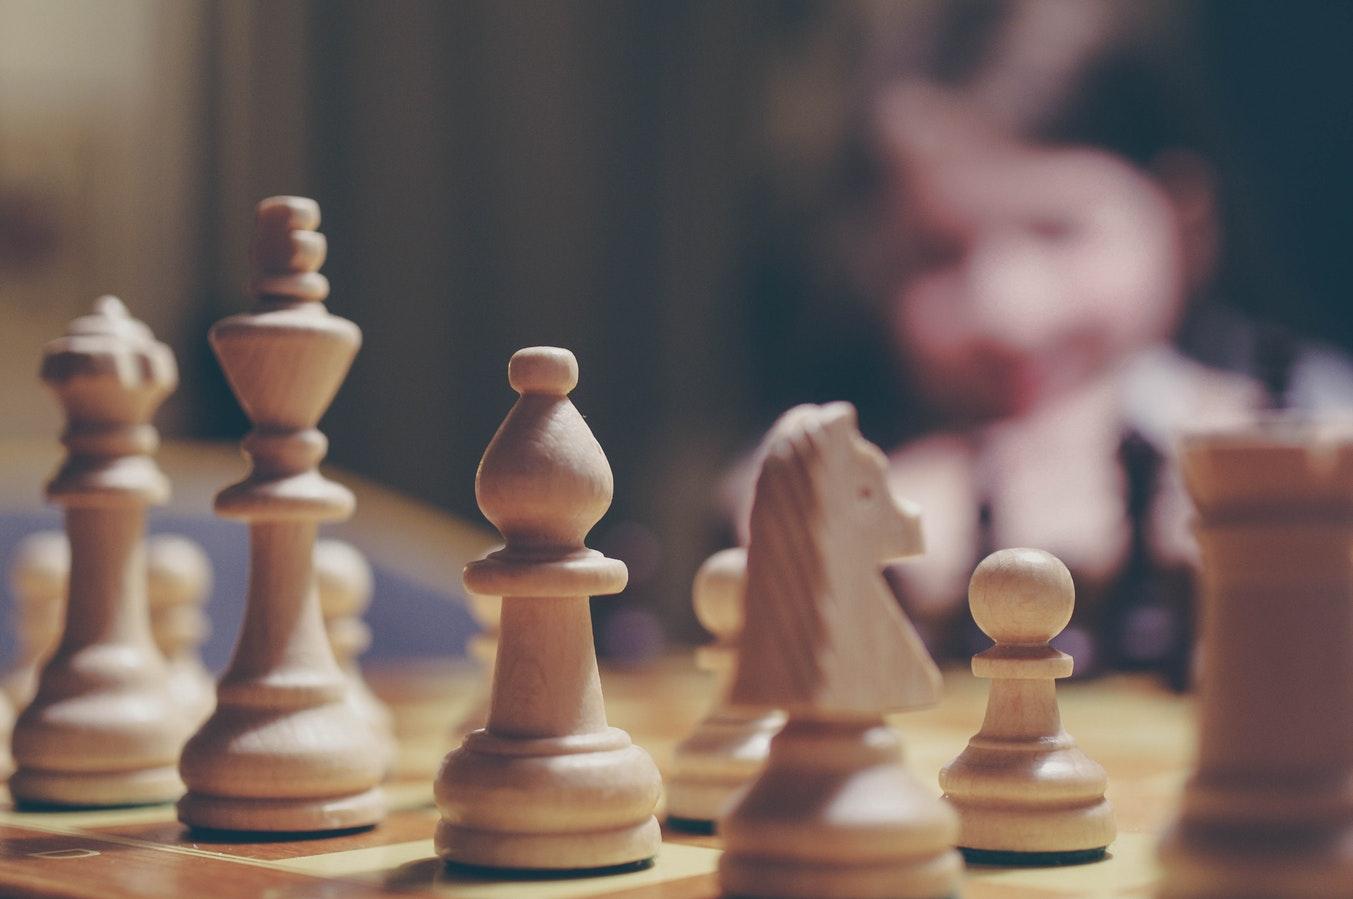 шахматы, фигура